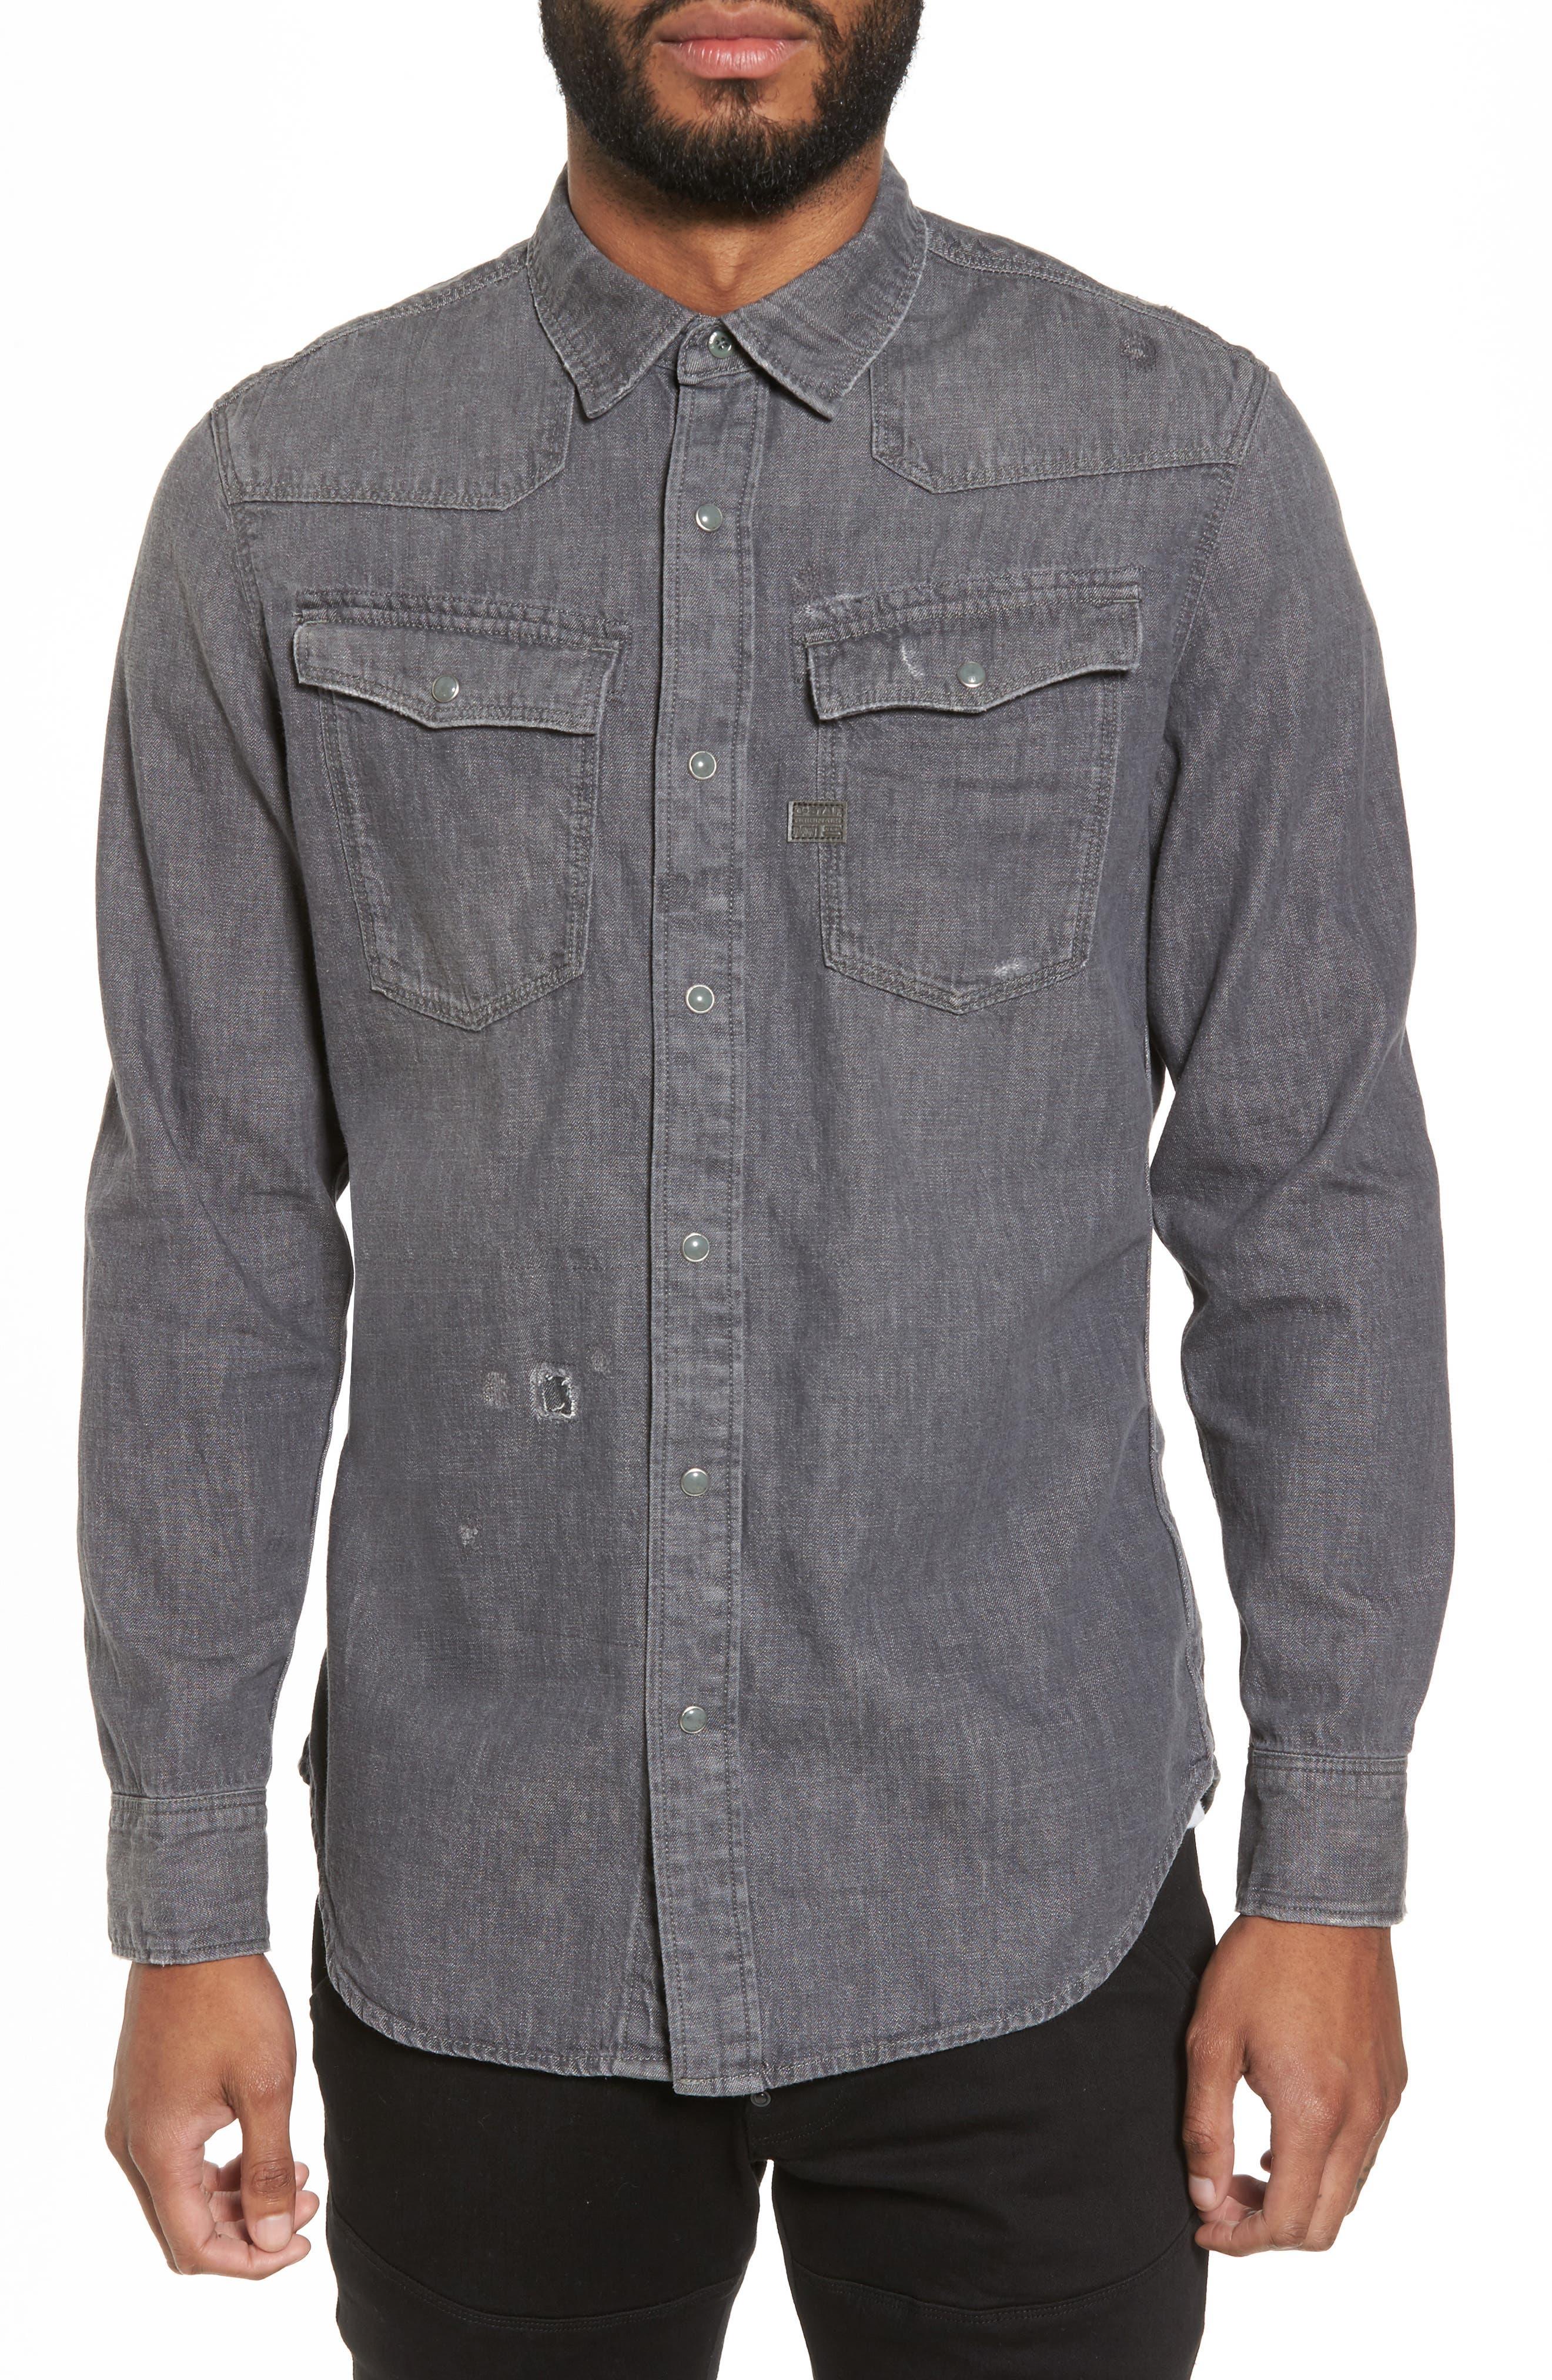 3301 Craser Denim Shirt,                             Main thumbnail 1, color,                             Medium Aged Restored